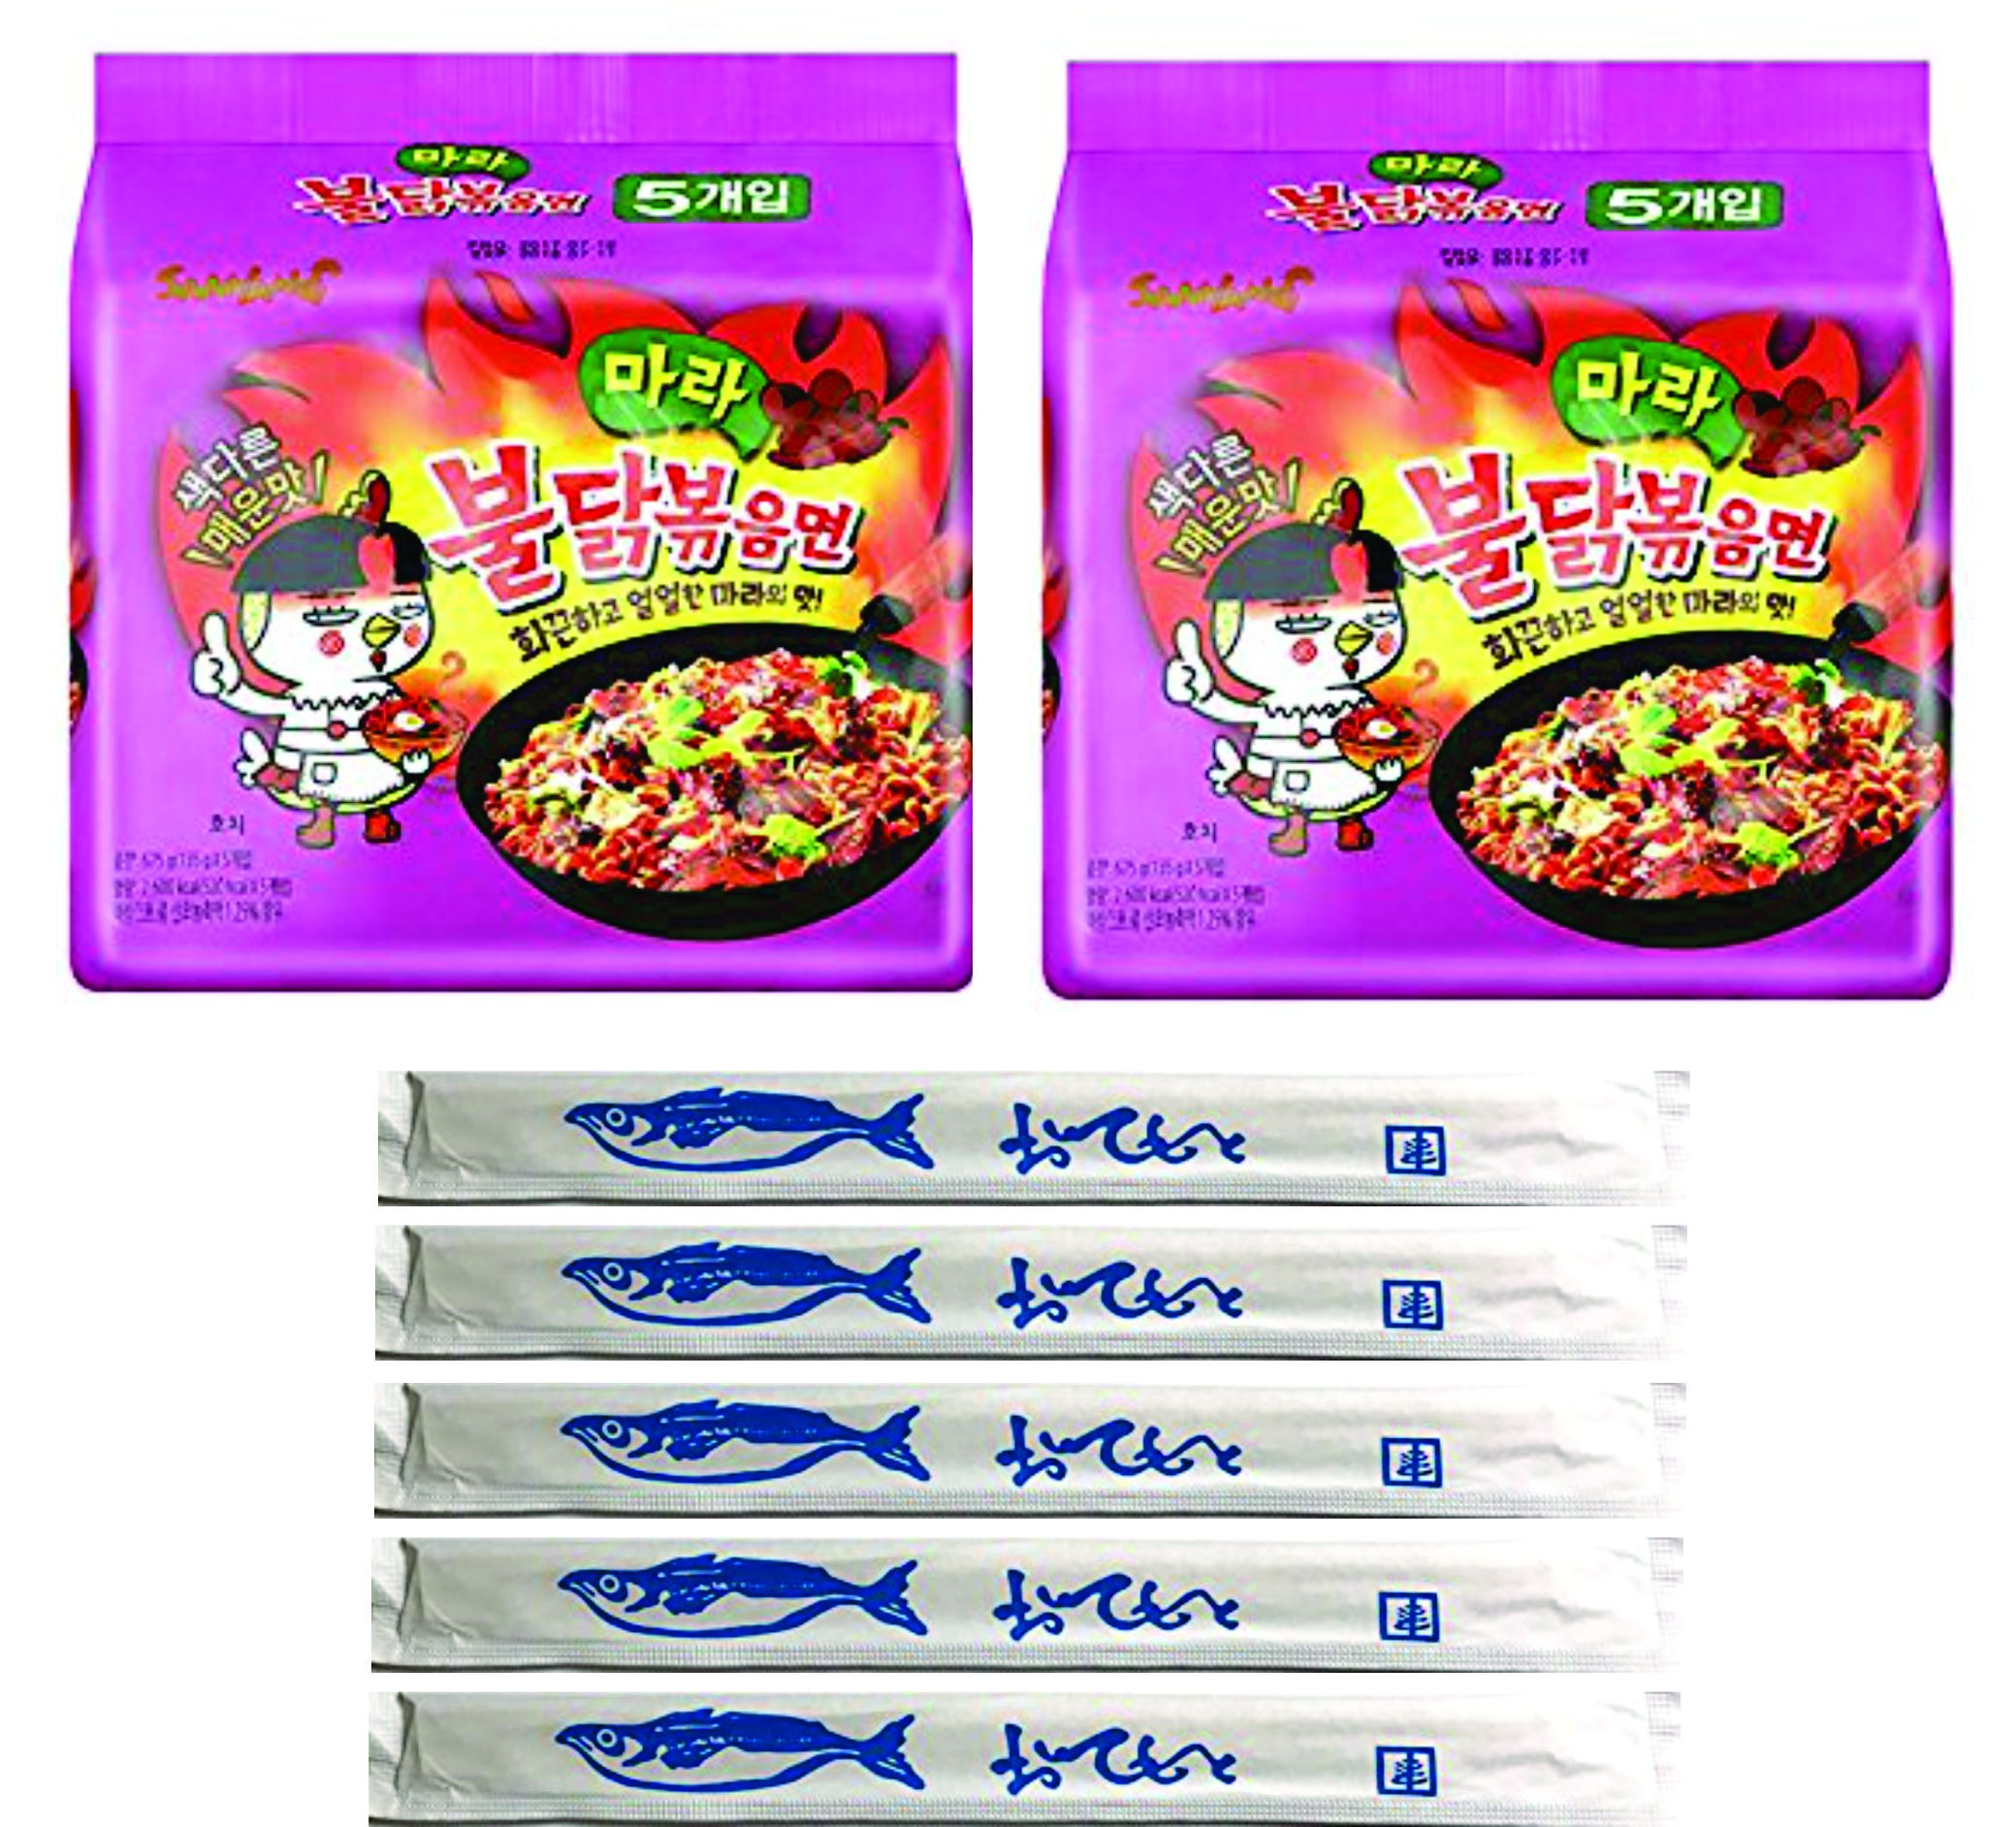 Samyang Spicy Chicken Ramen, MALA flavor, Pack of 10, With 5 Fish Logo Chopsticks